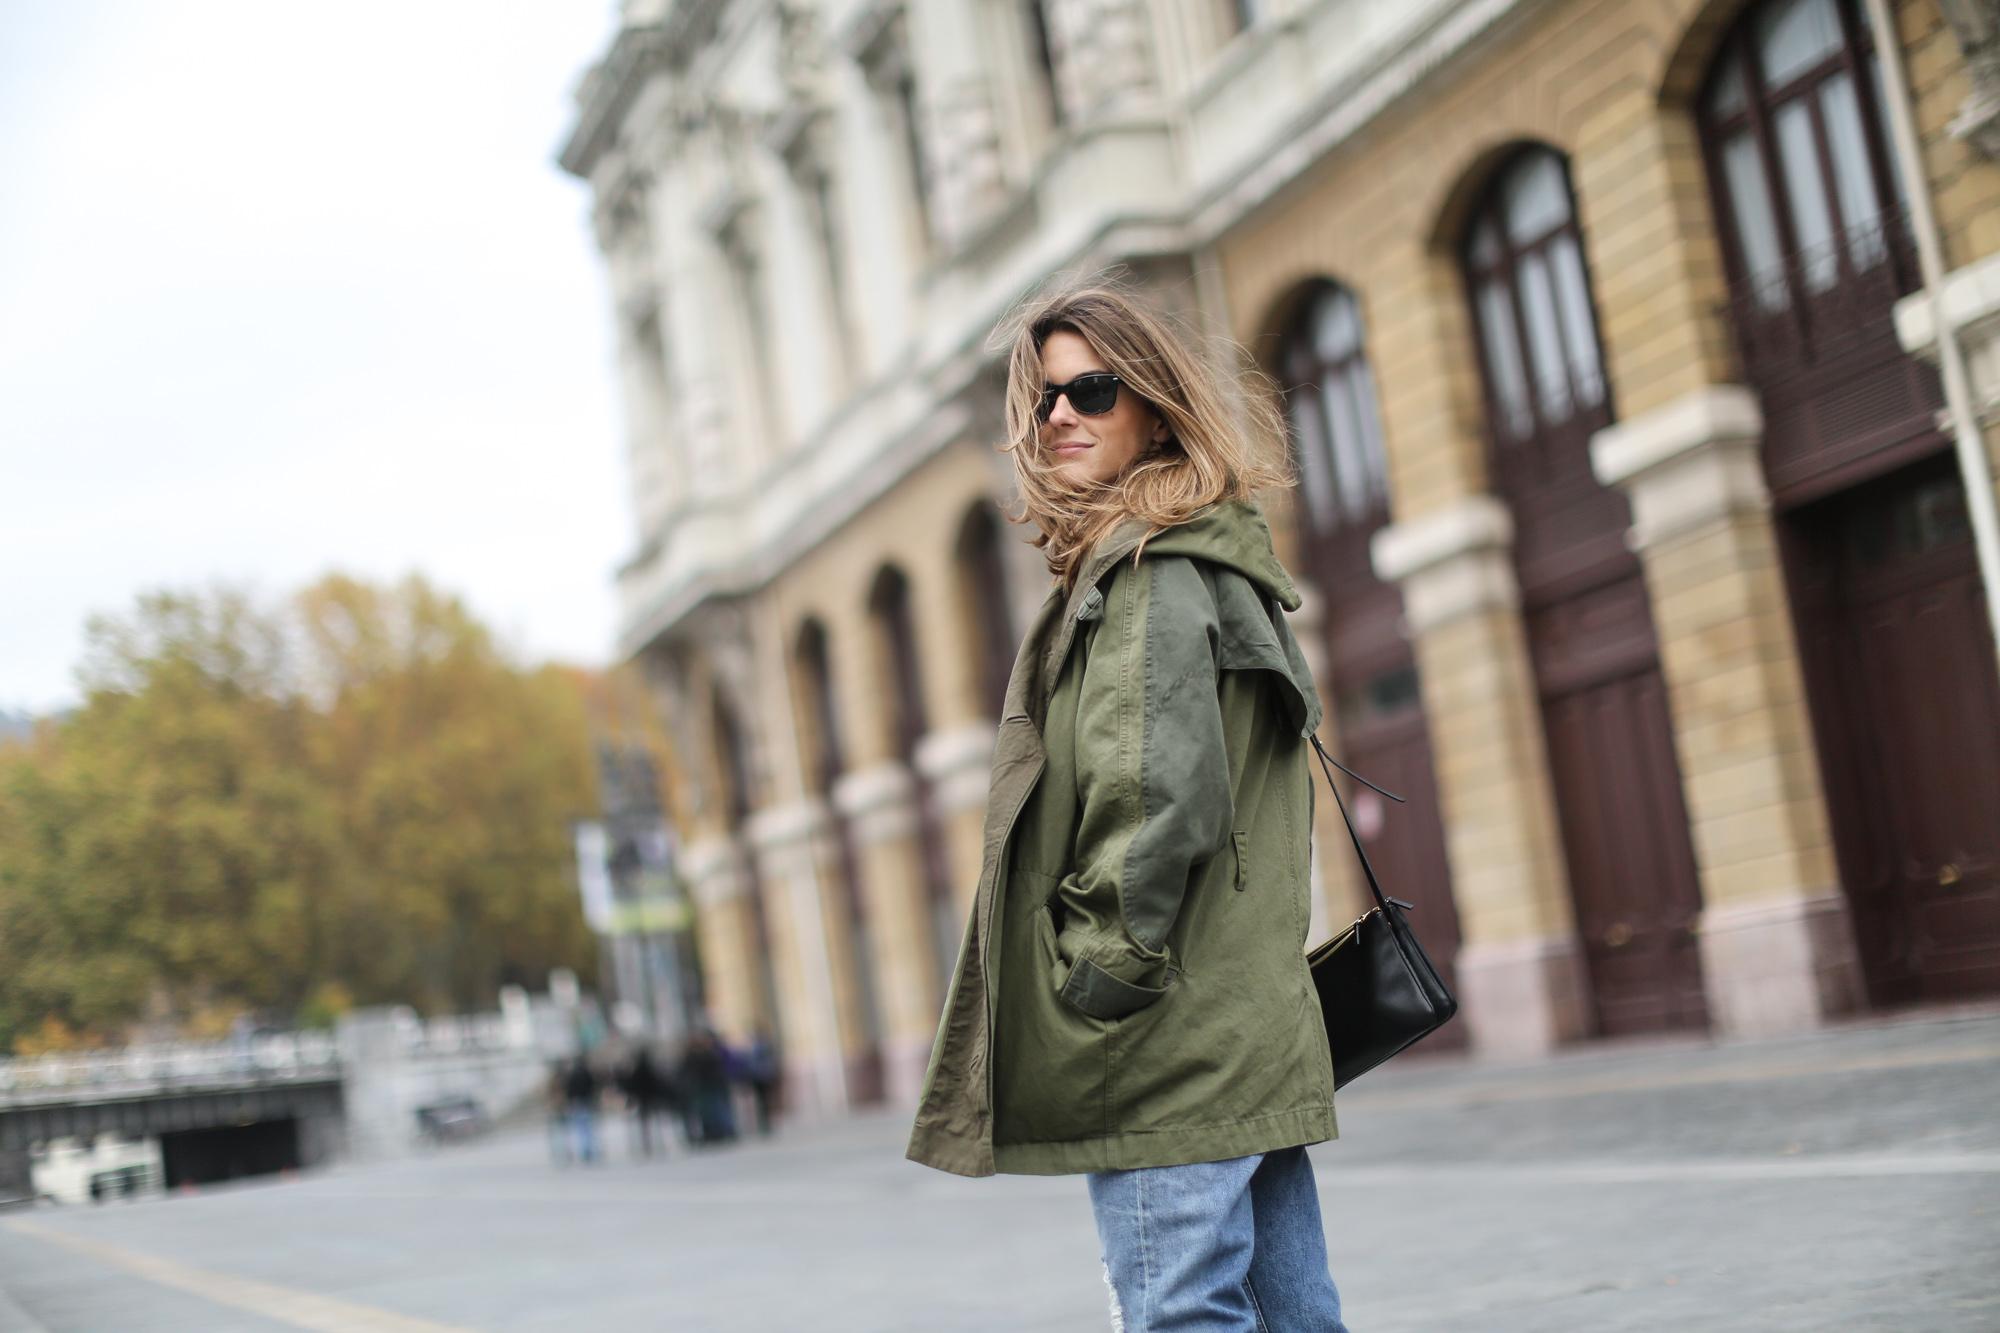 Clochet-streetstyle-isabel-marant-etoile-ellison-parka-acne-studios-jeans-adidas-stan-smith-2